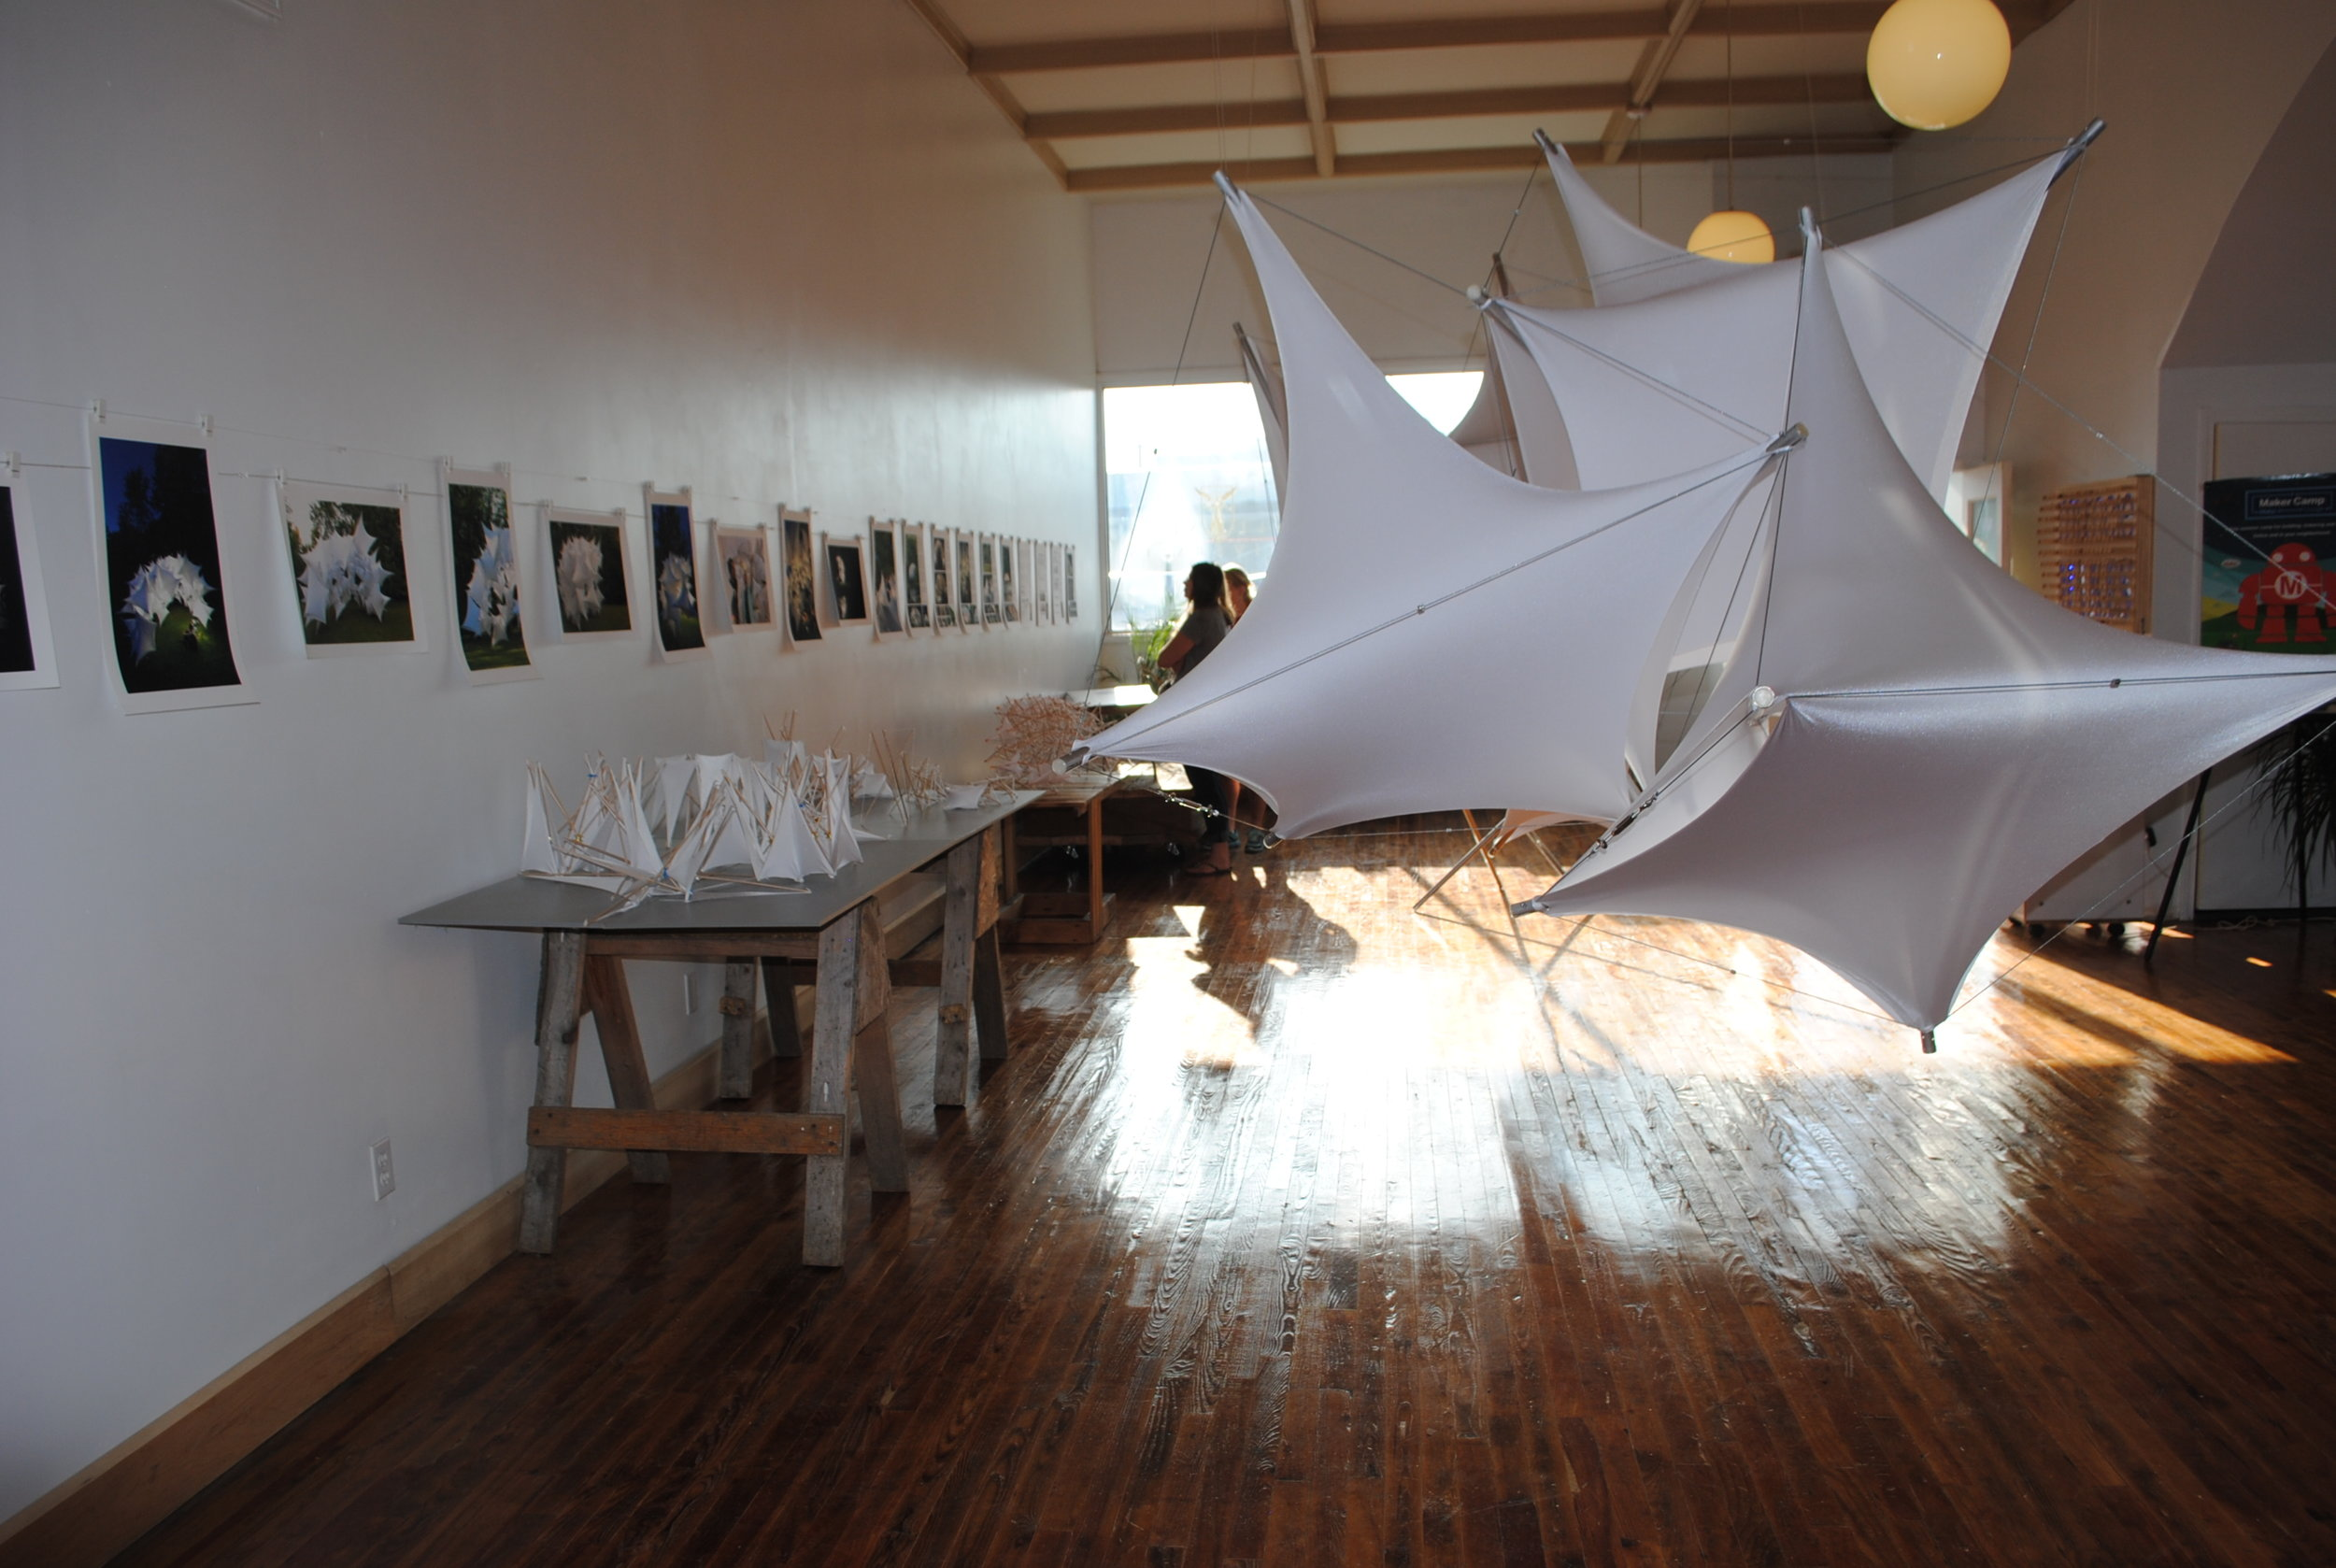 Exhibition at Muncie Makes Lab Sept 2014